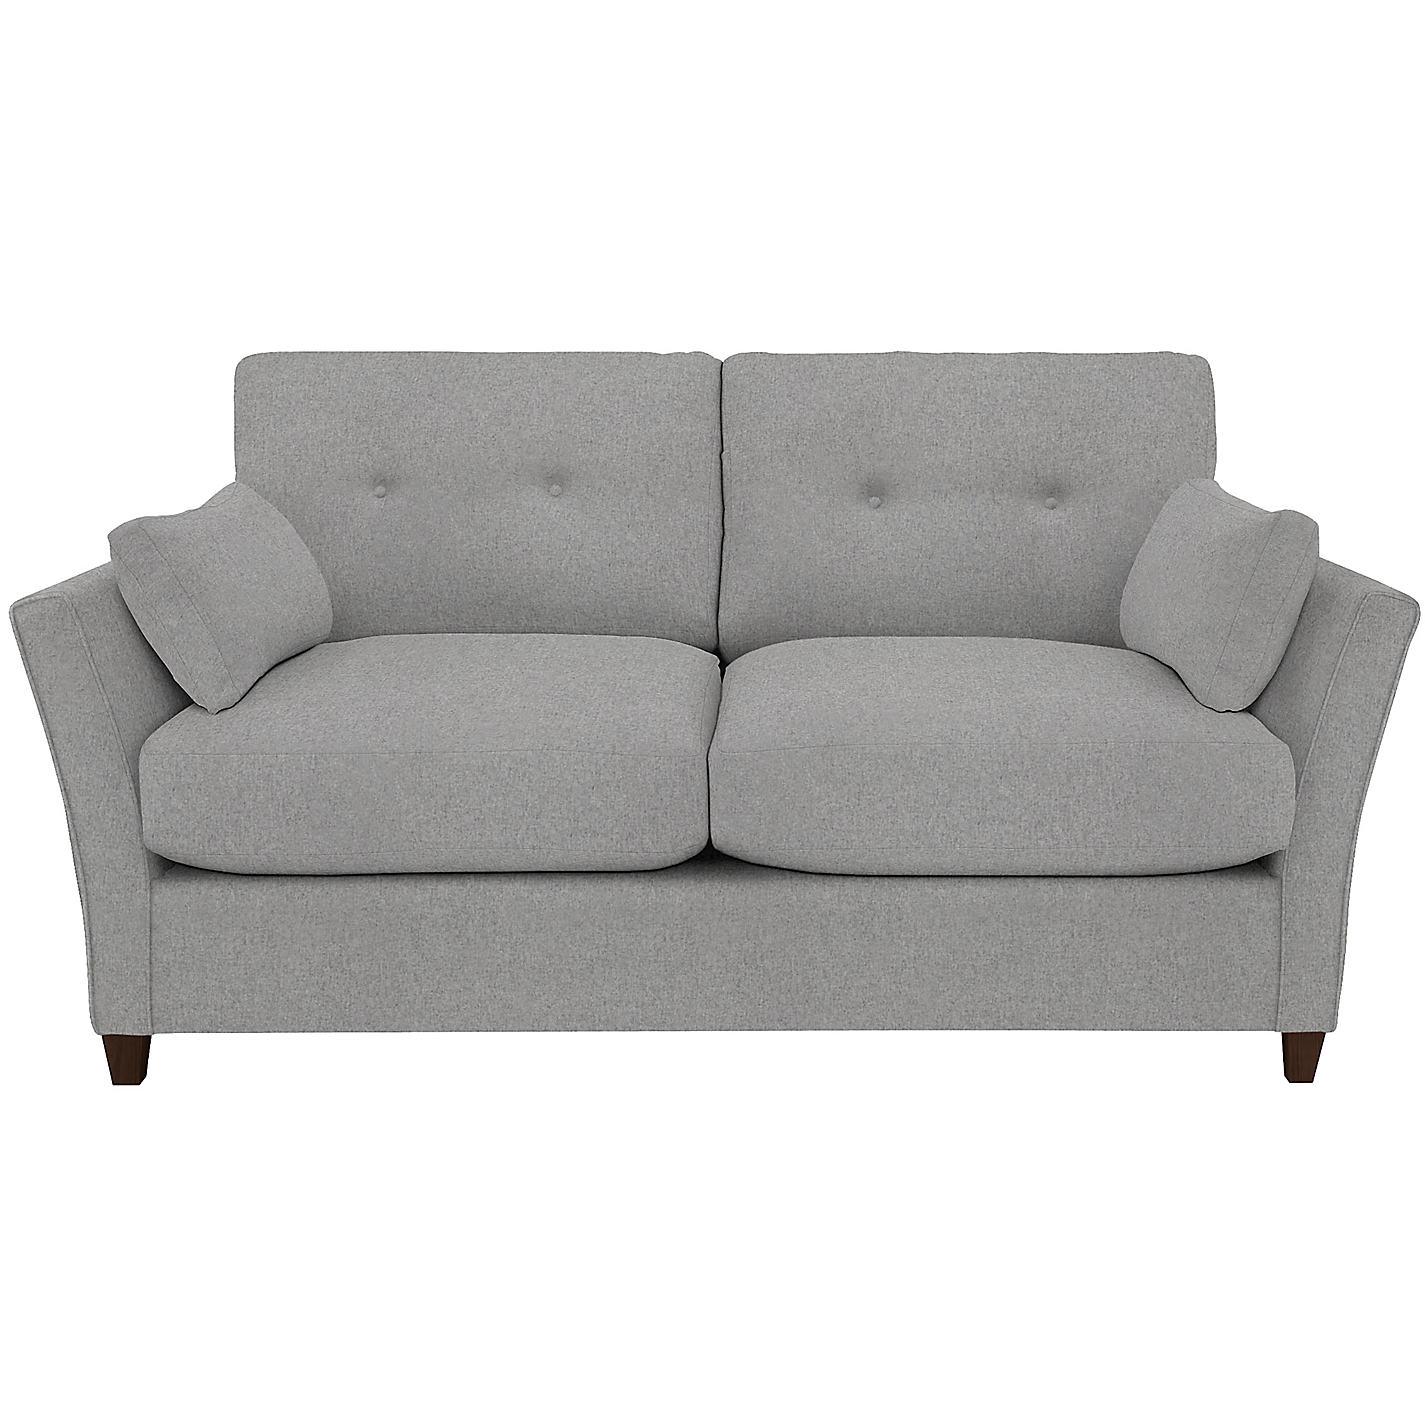 Buy John Lewis Chopin Medium Sofa Bed With Pocket Sprung Mattress  ~ New Mattress For Sofa Bed